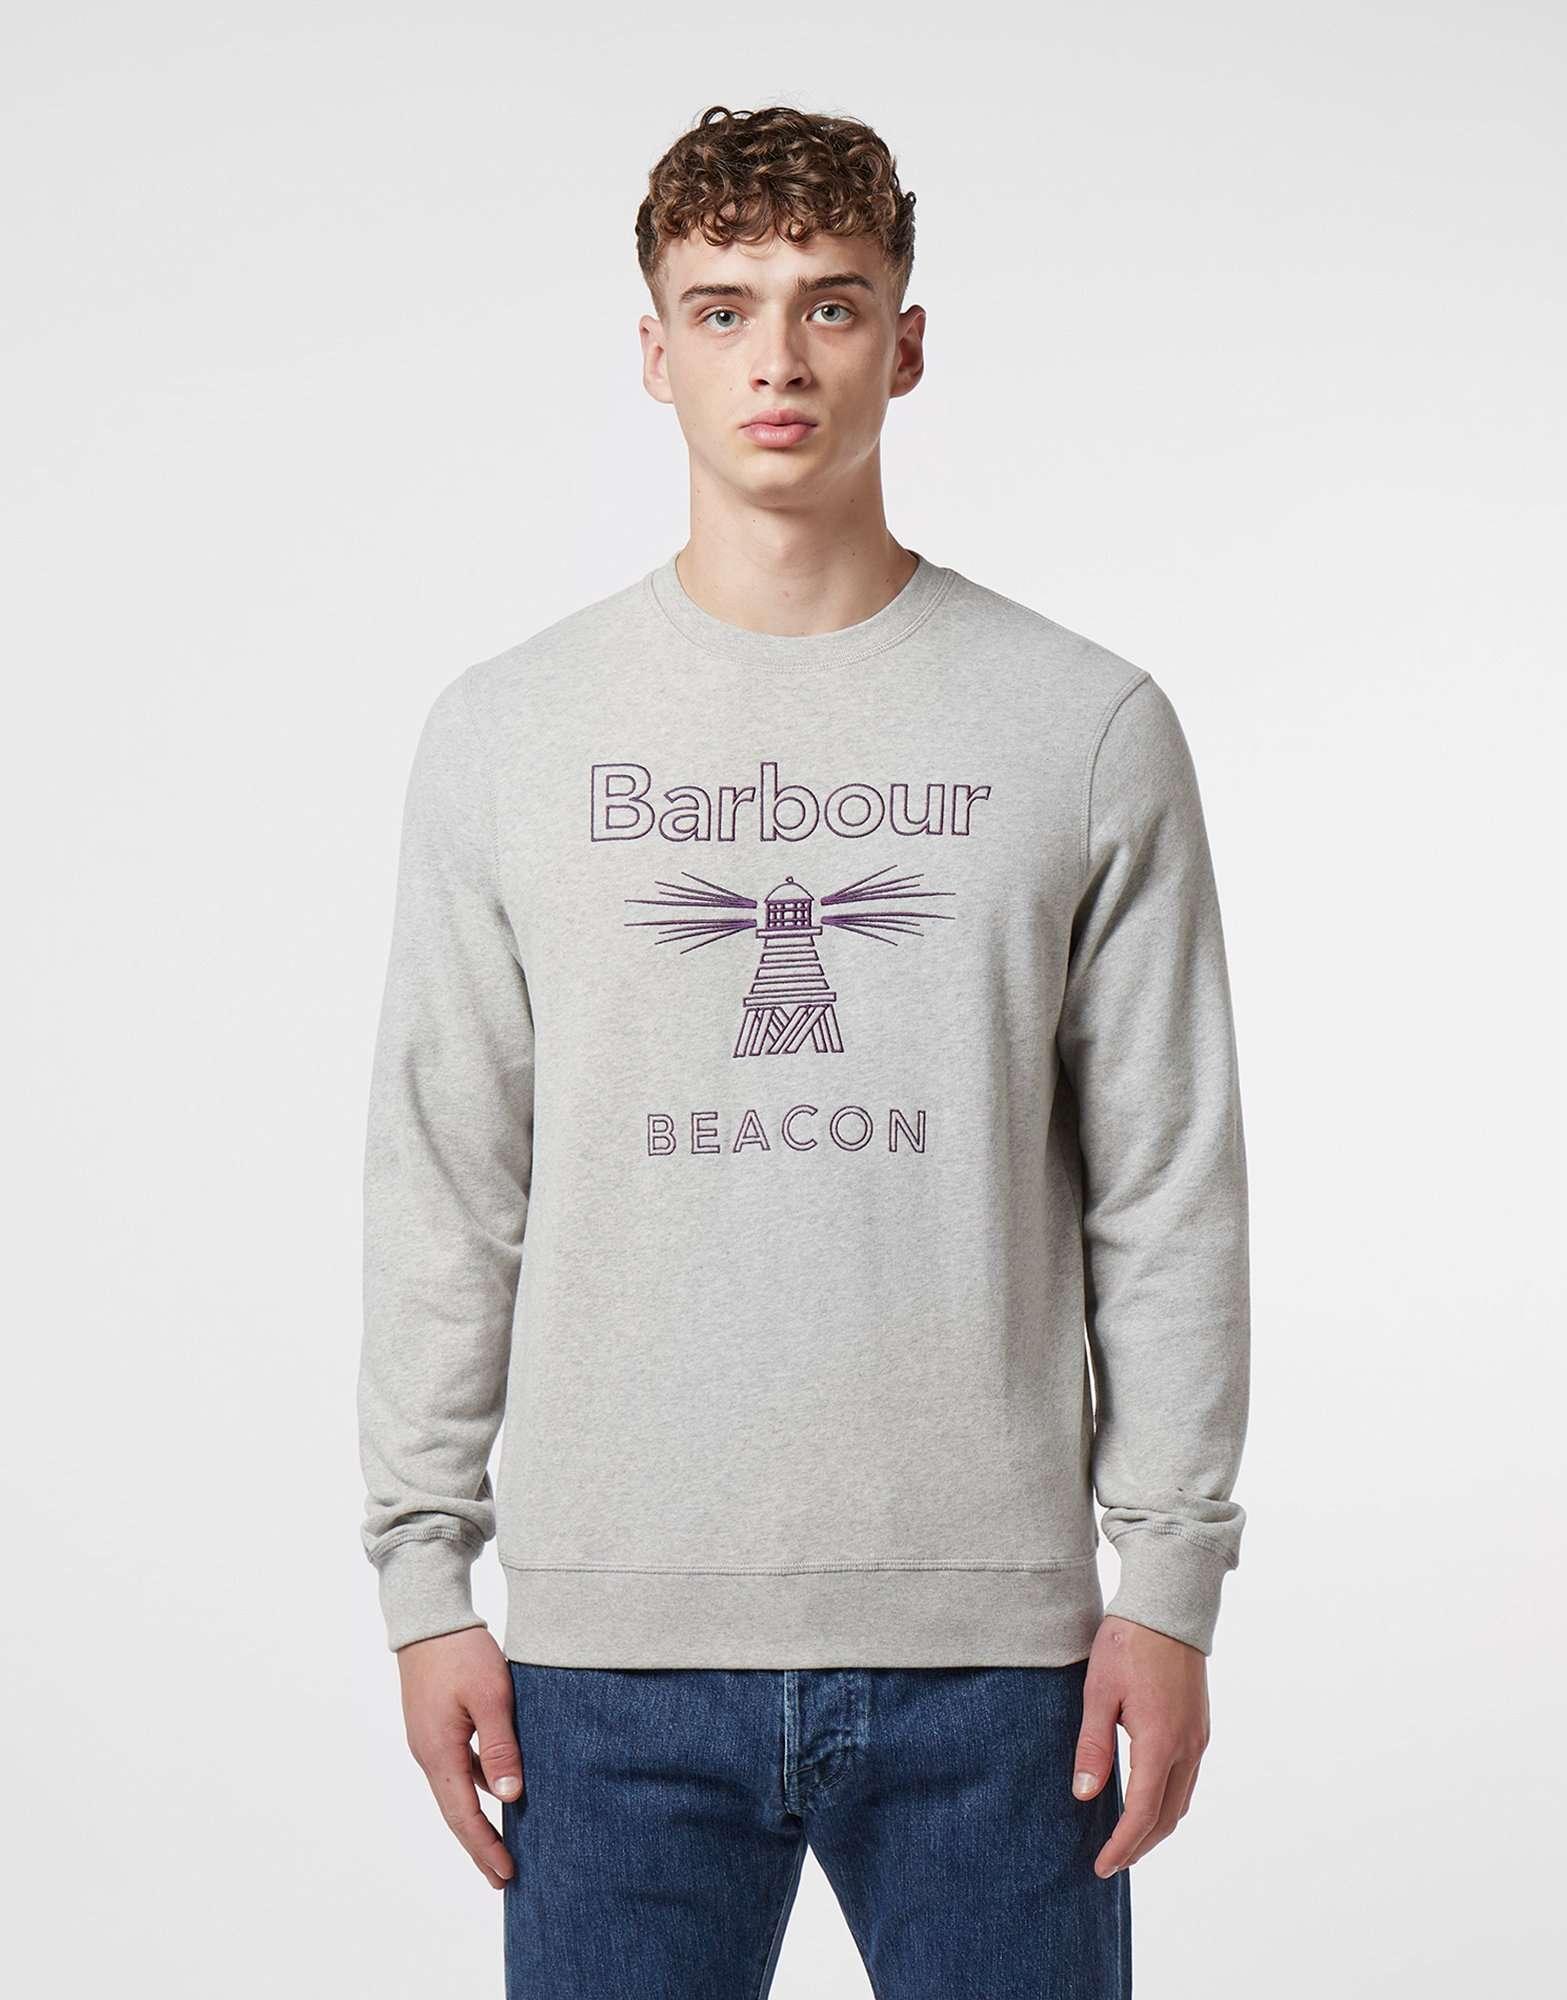 Barbour Beacon Stitch Logo Sweatshirt